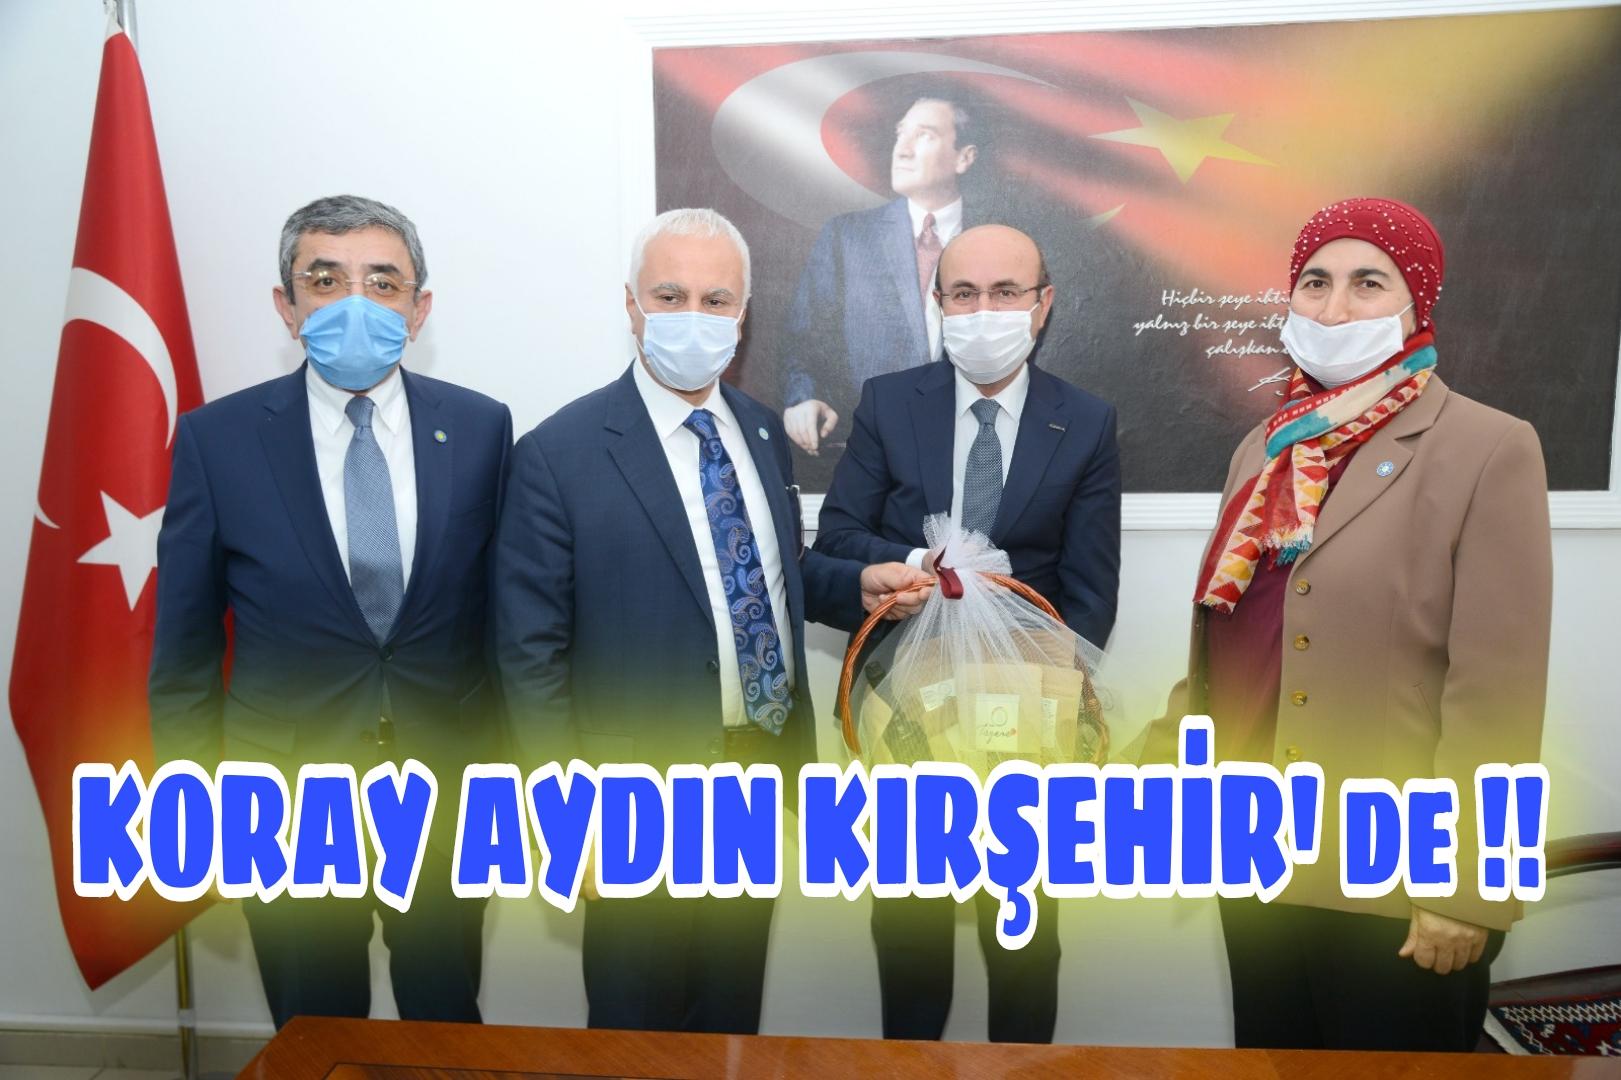 KORAY AYDIN KIRŞEHİR'DE !!